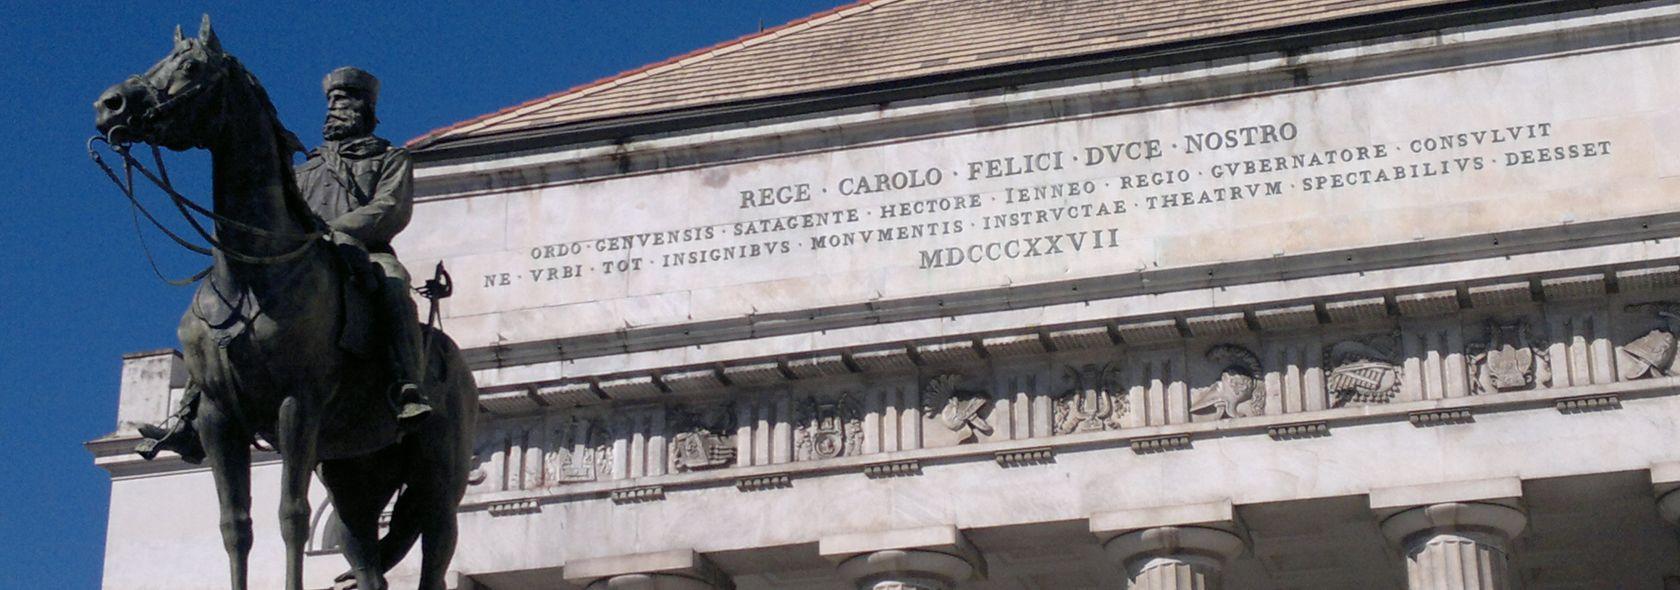 Il Teatro Carlo Felice - fronton